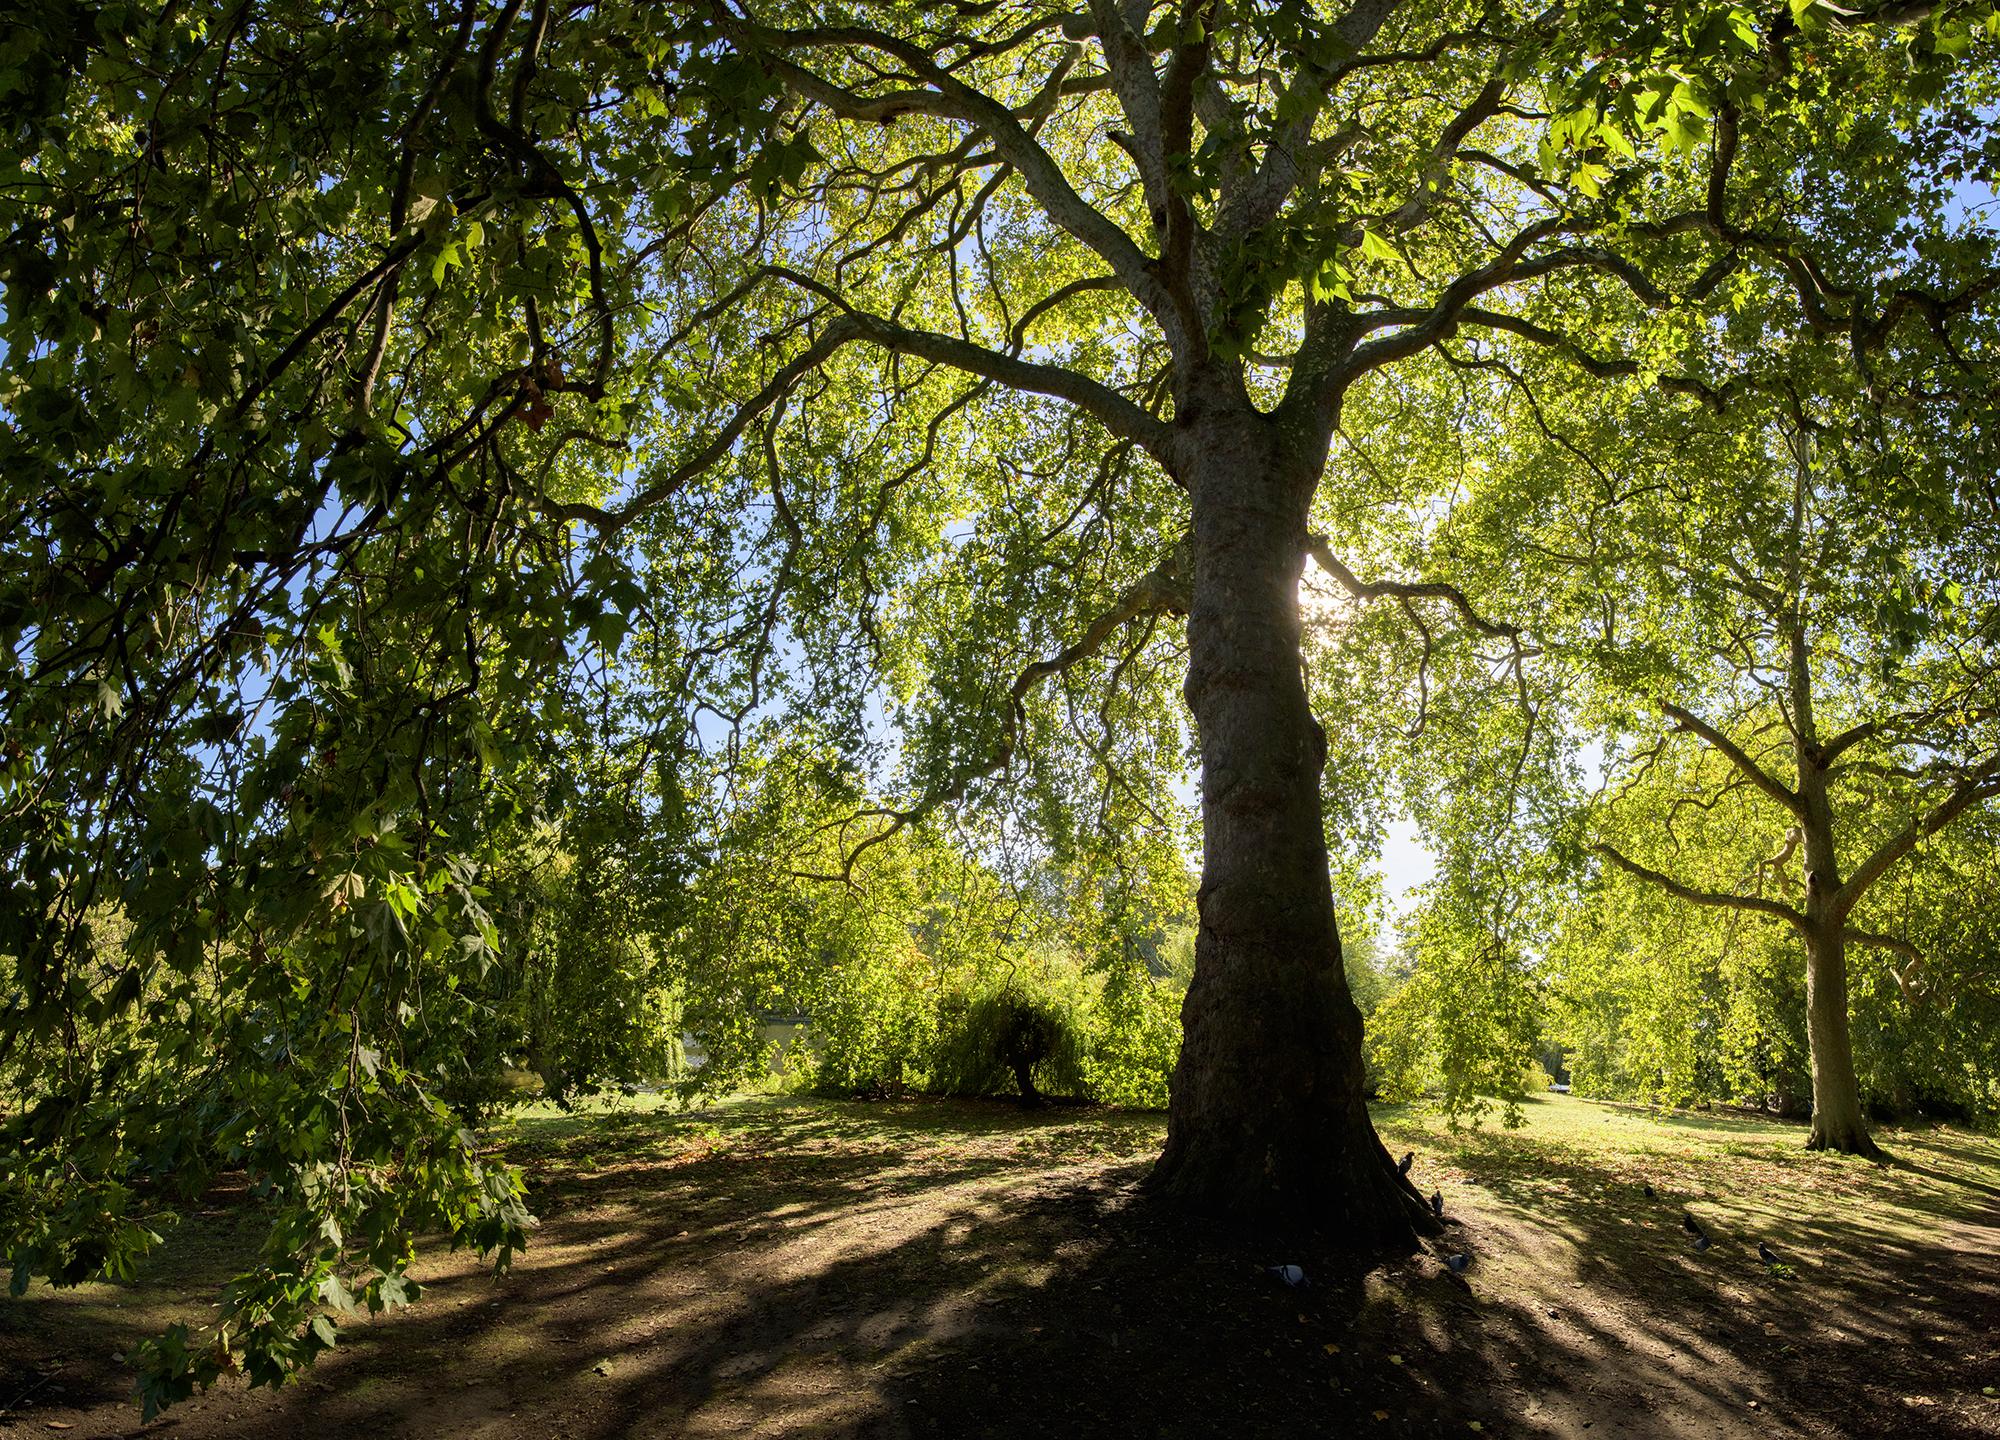 tree in st james park london